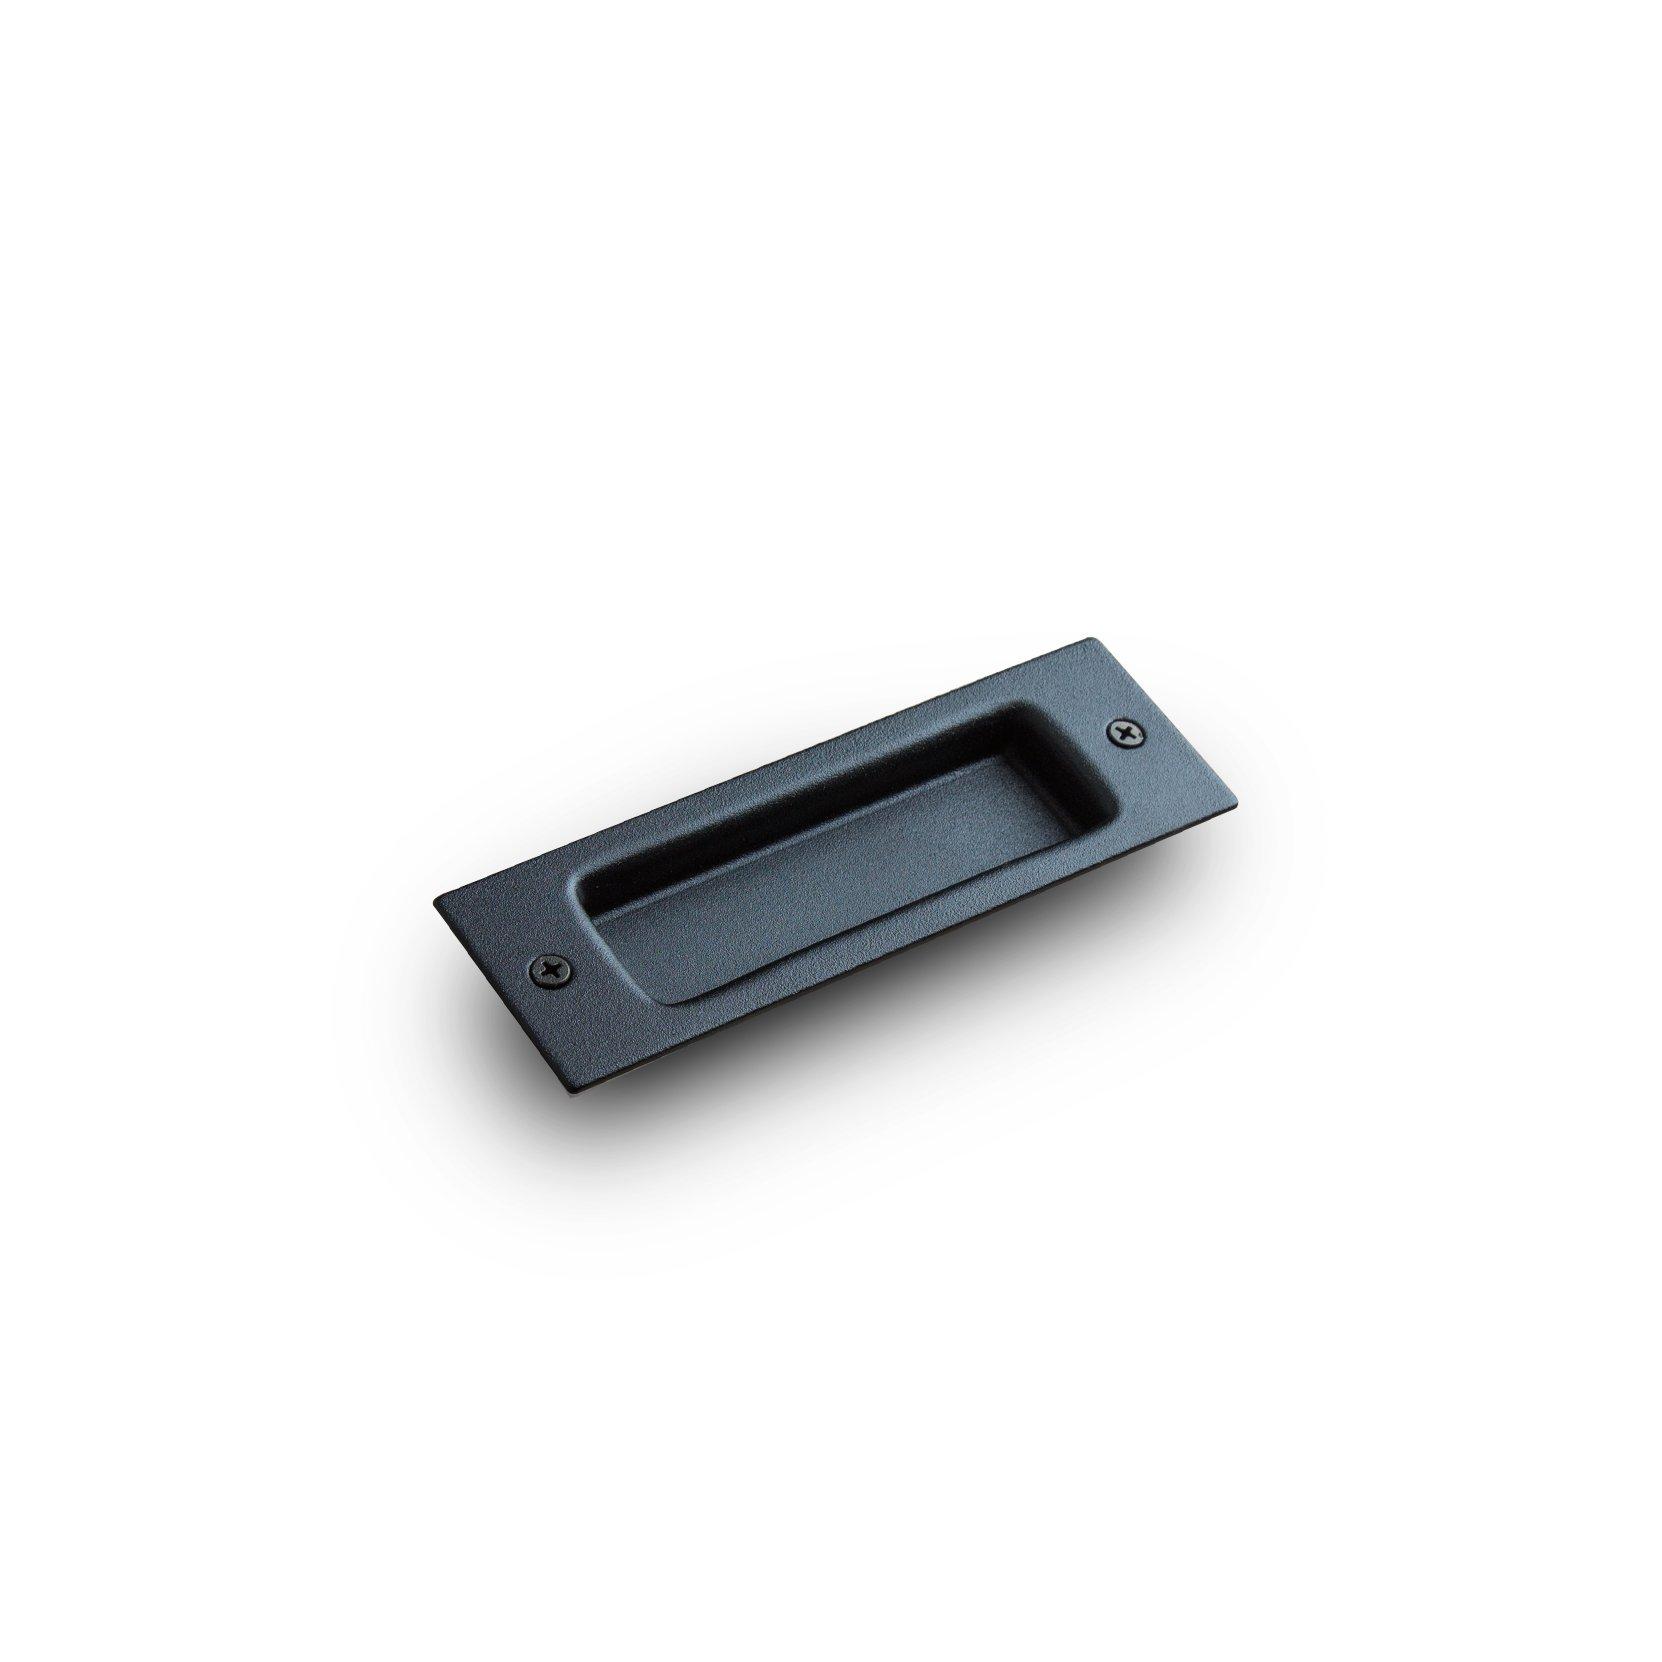 Flush Barn Door Handle Pull Grab for Sliding BarnDoor Hardware Artisan Hardware (Black) by Artisan Hardware (Image #1)